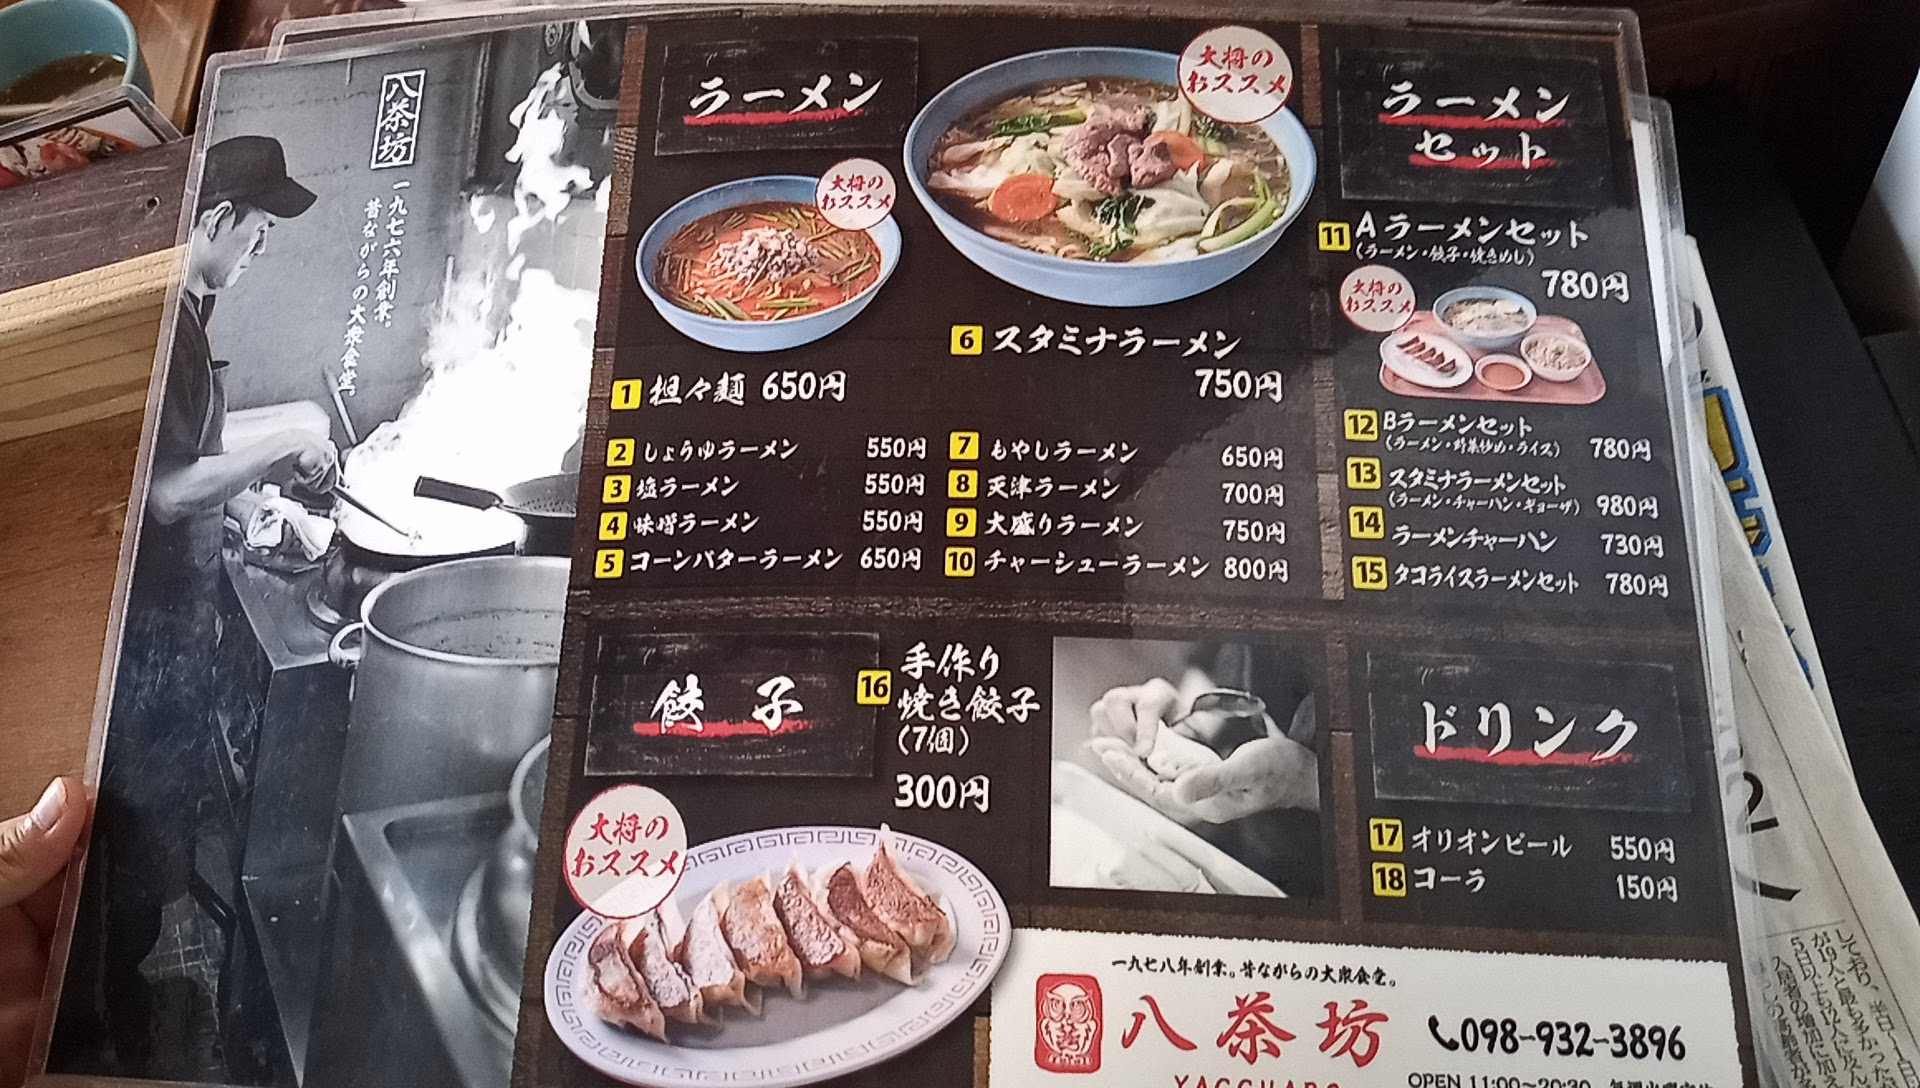 the menu of Yacchabou 2